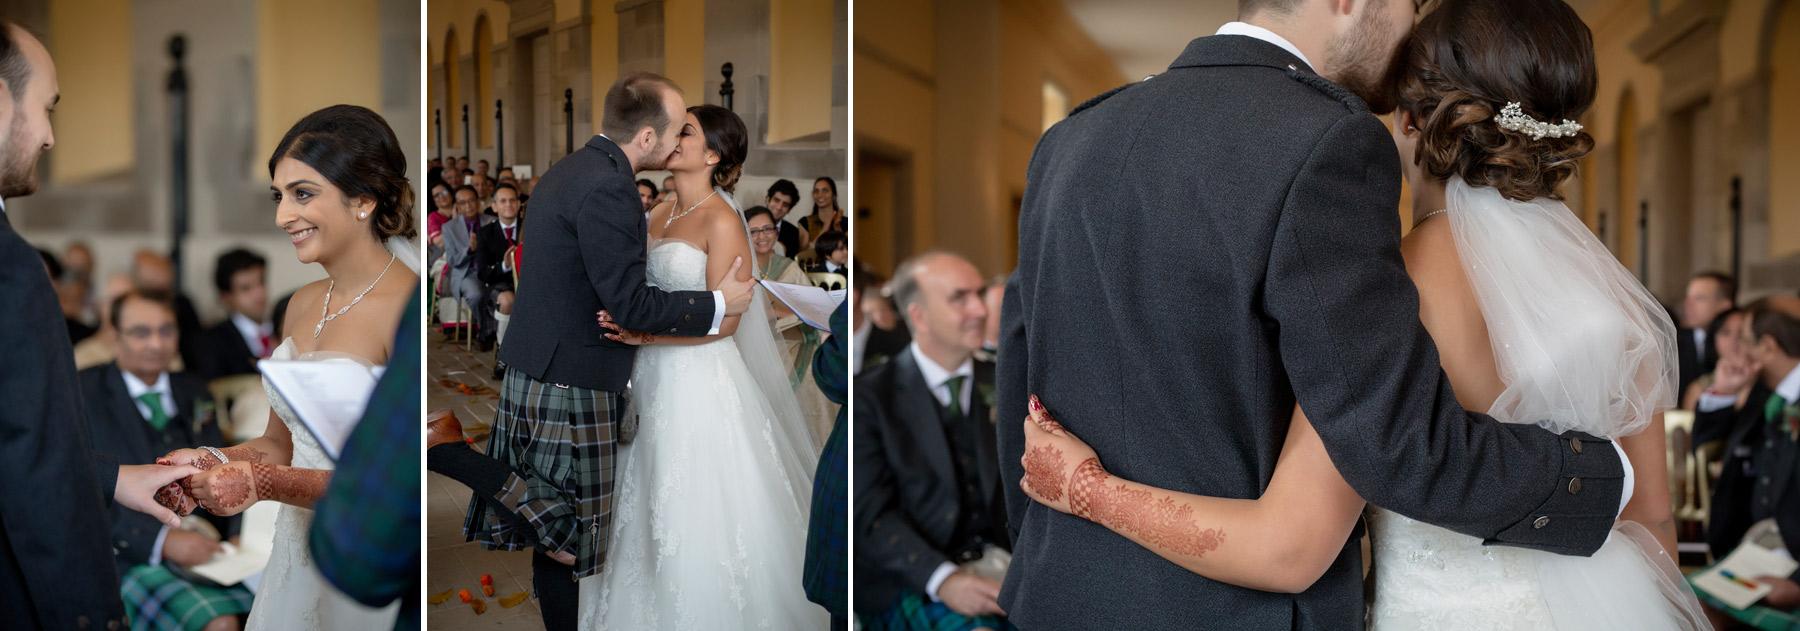 just married at hopetoun house scotland